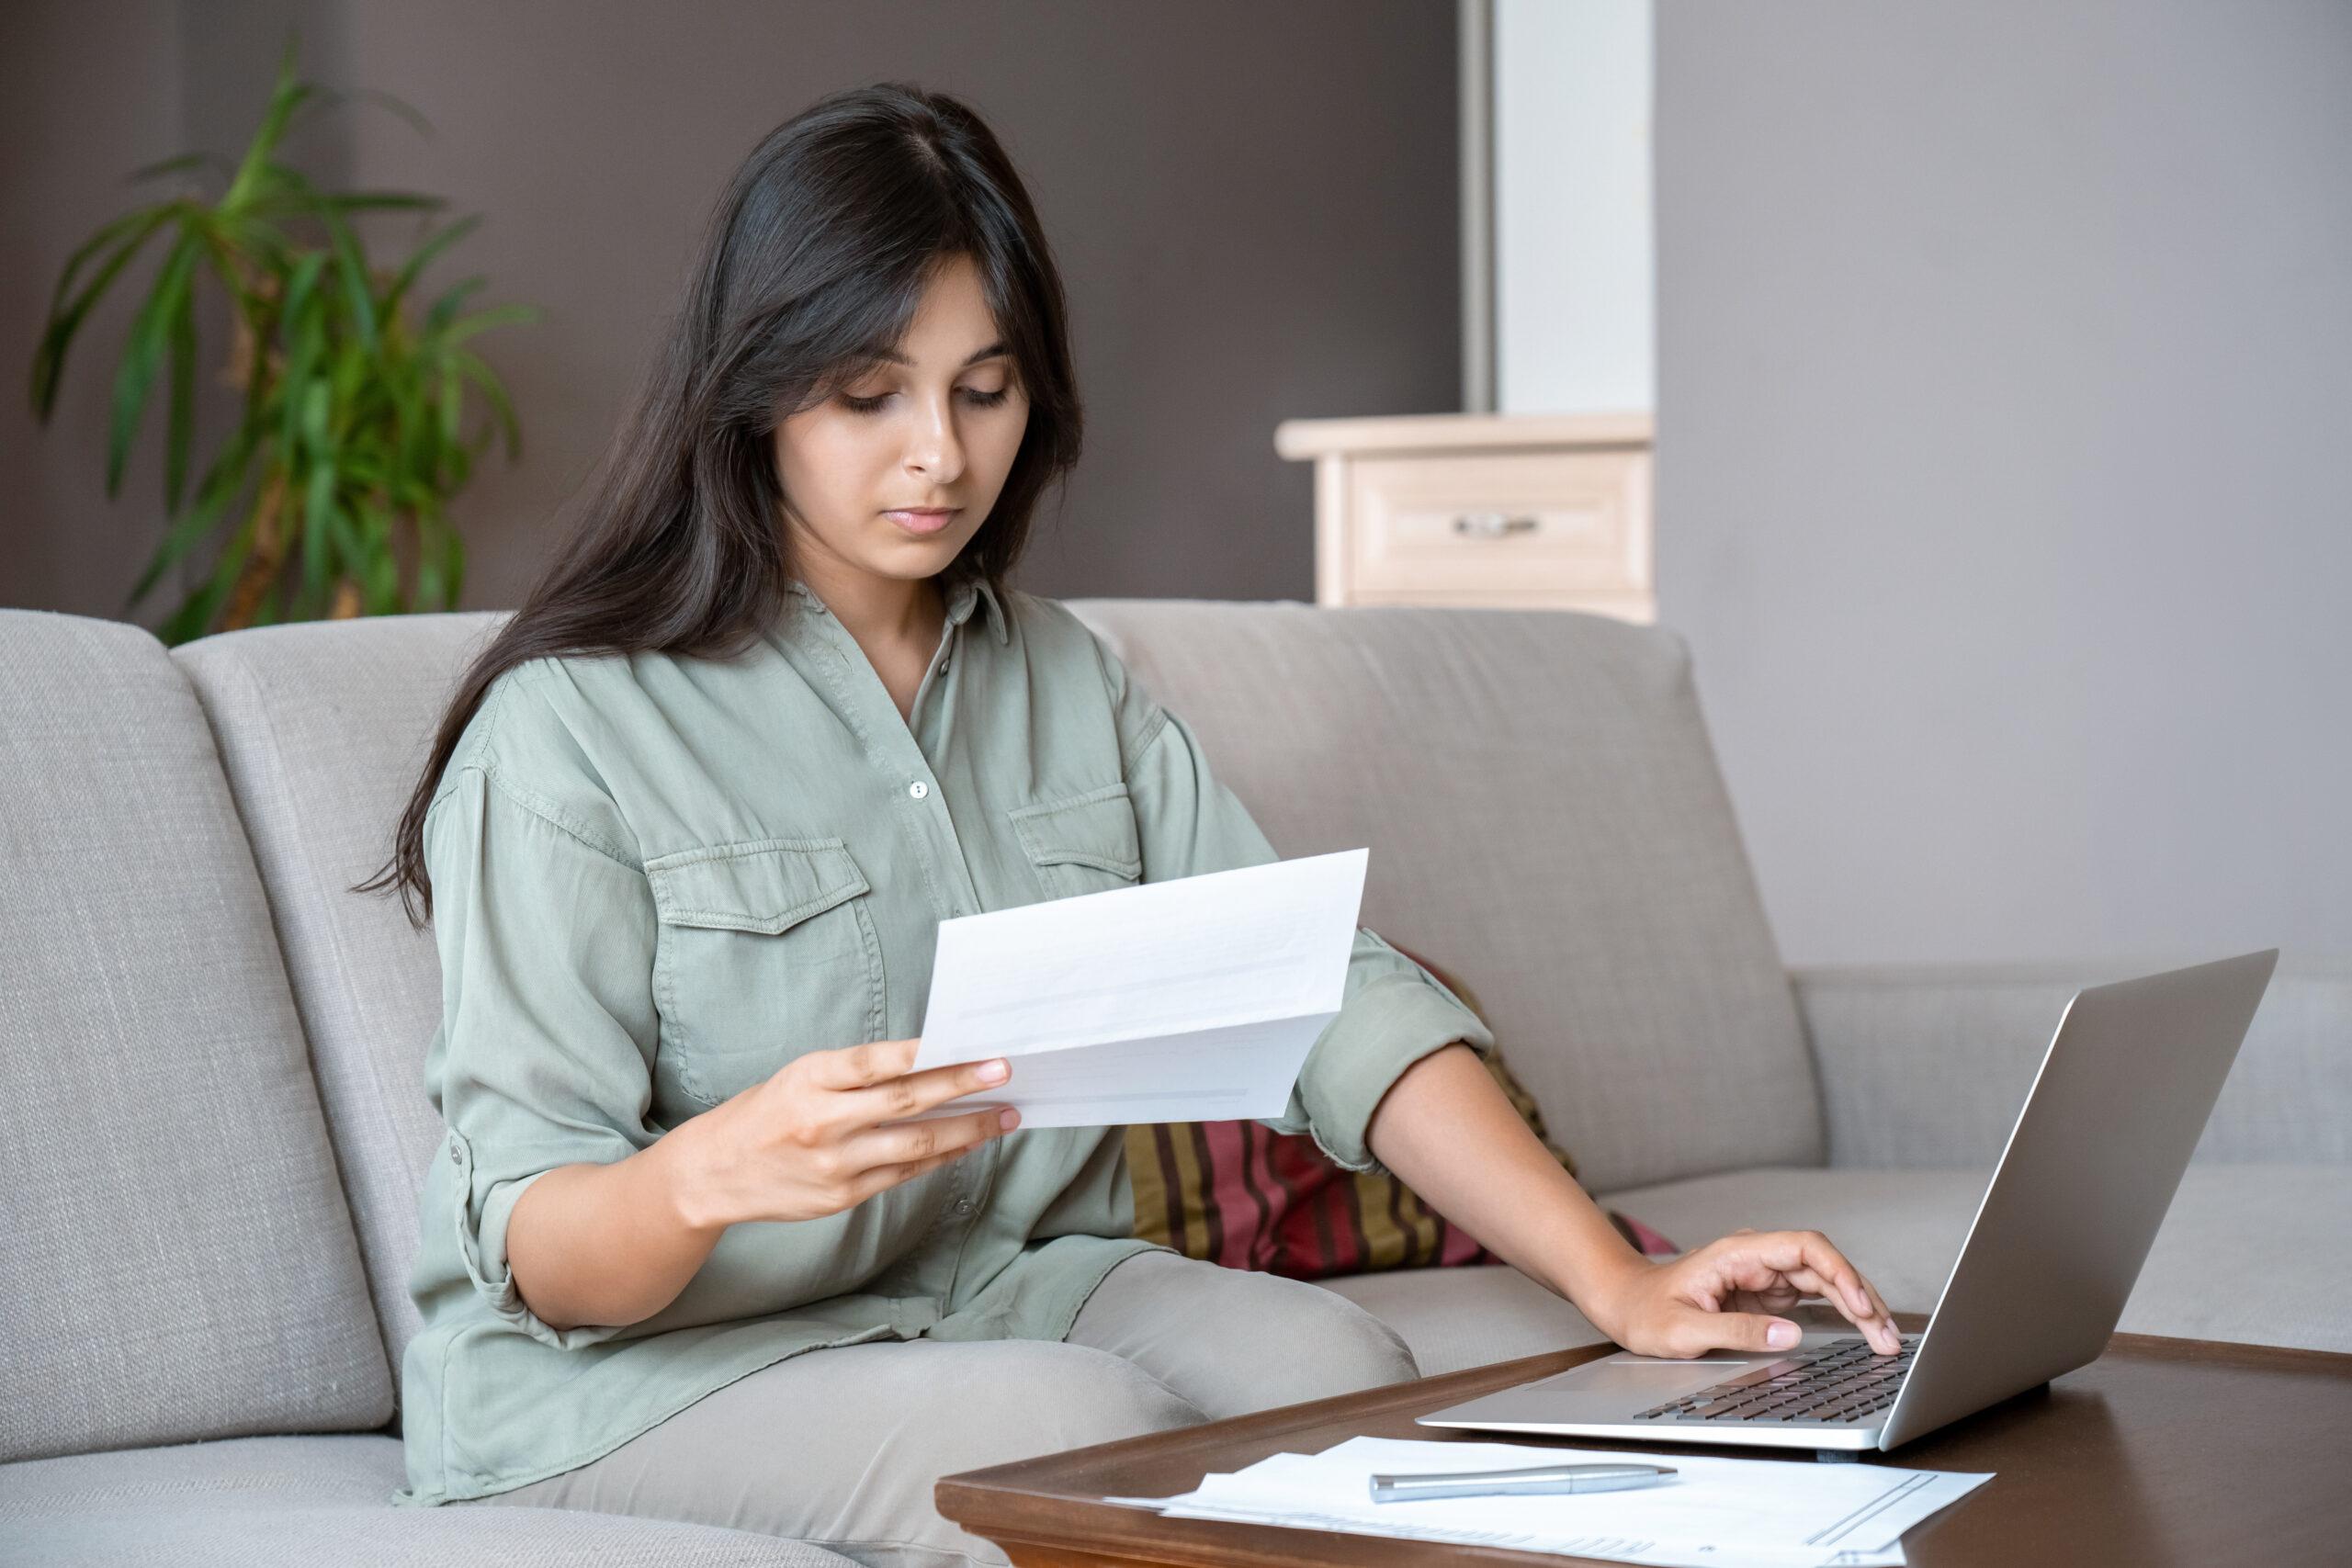 Young woman paying bills